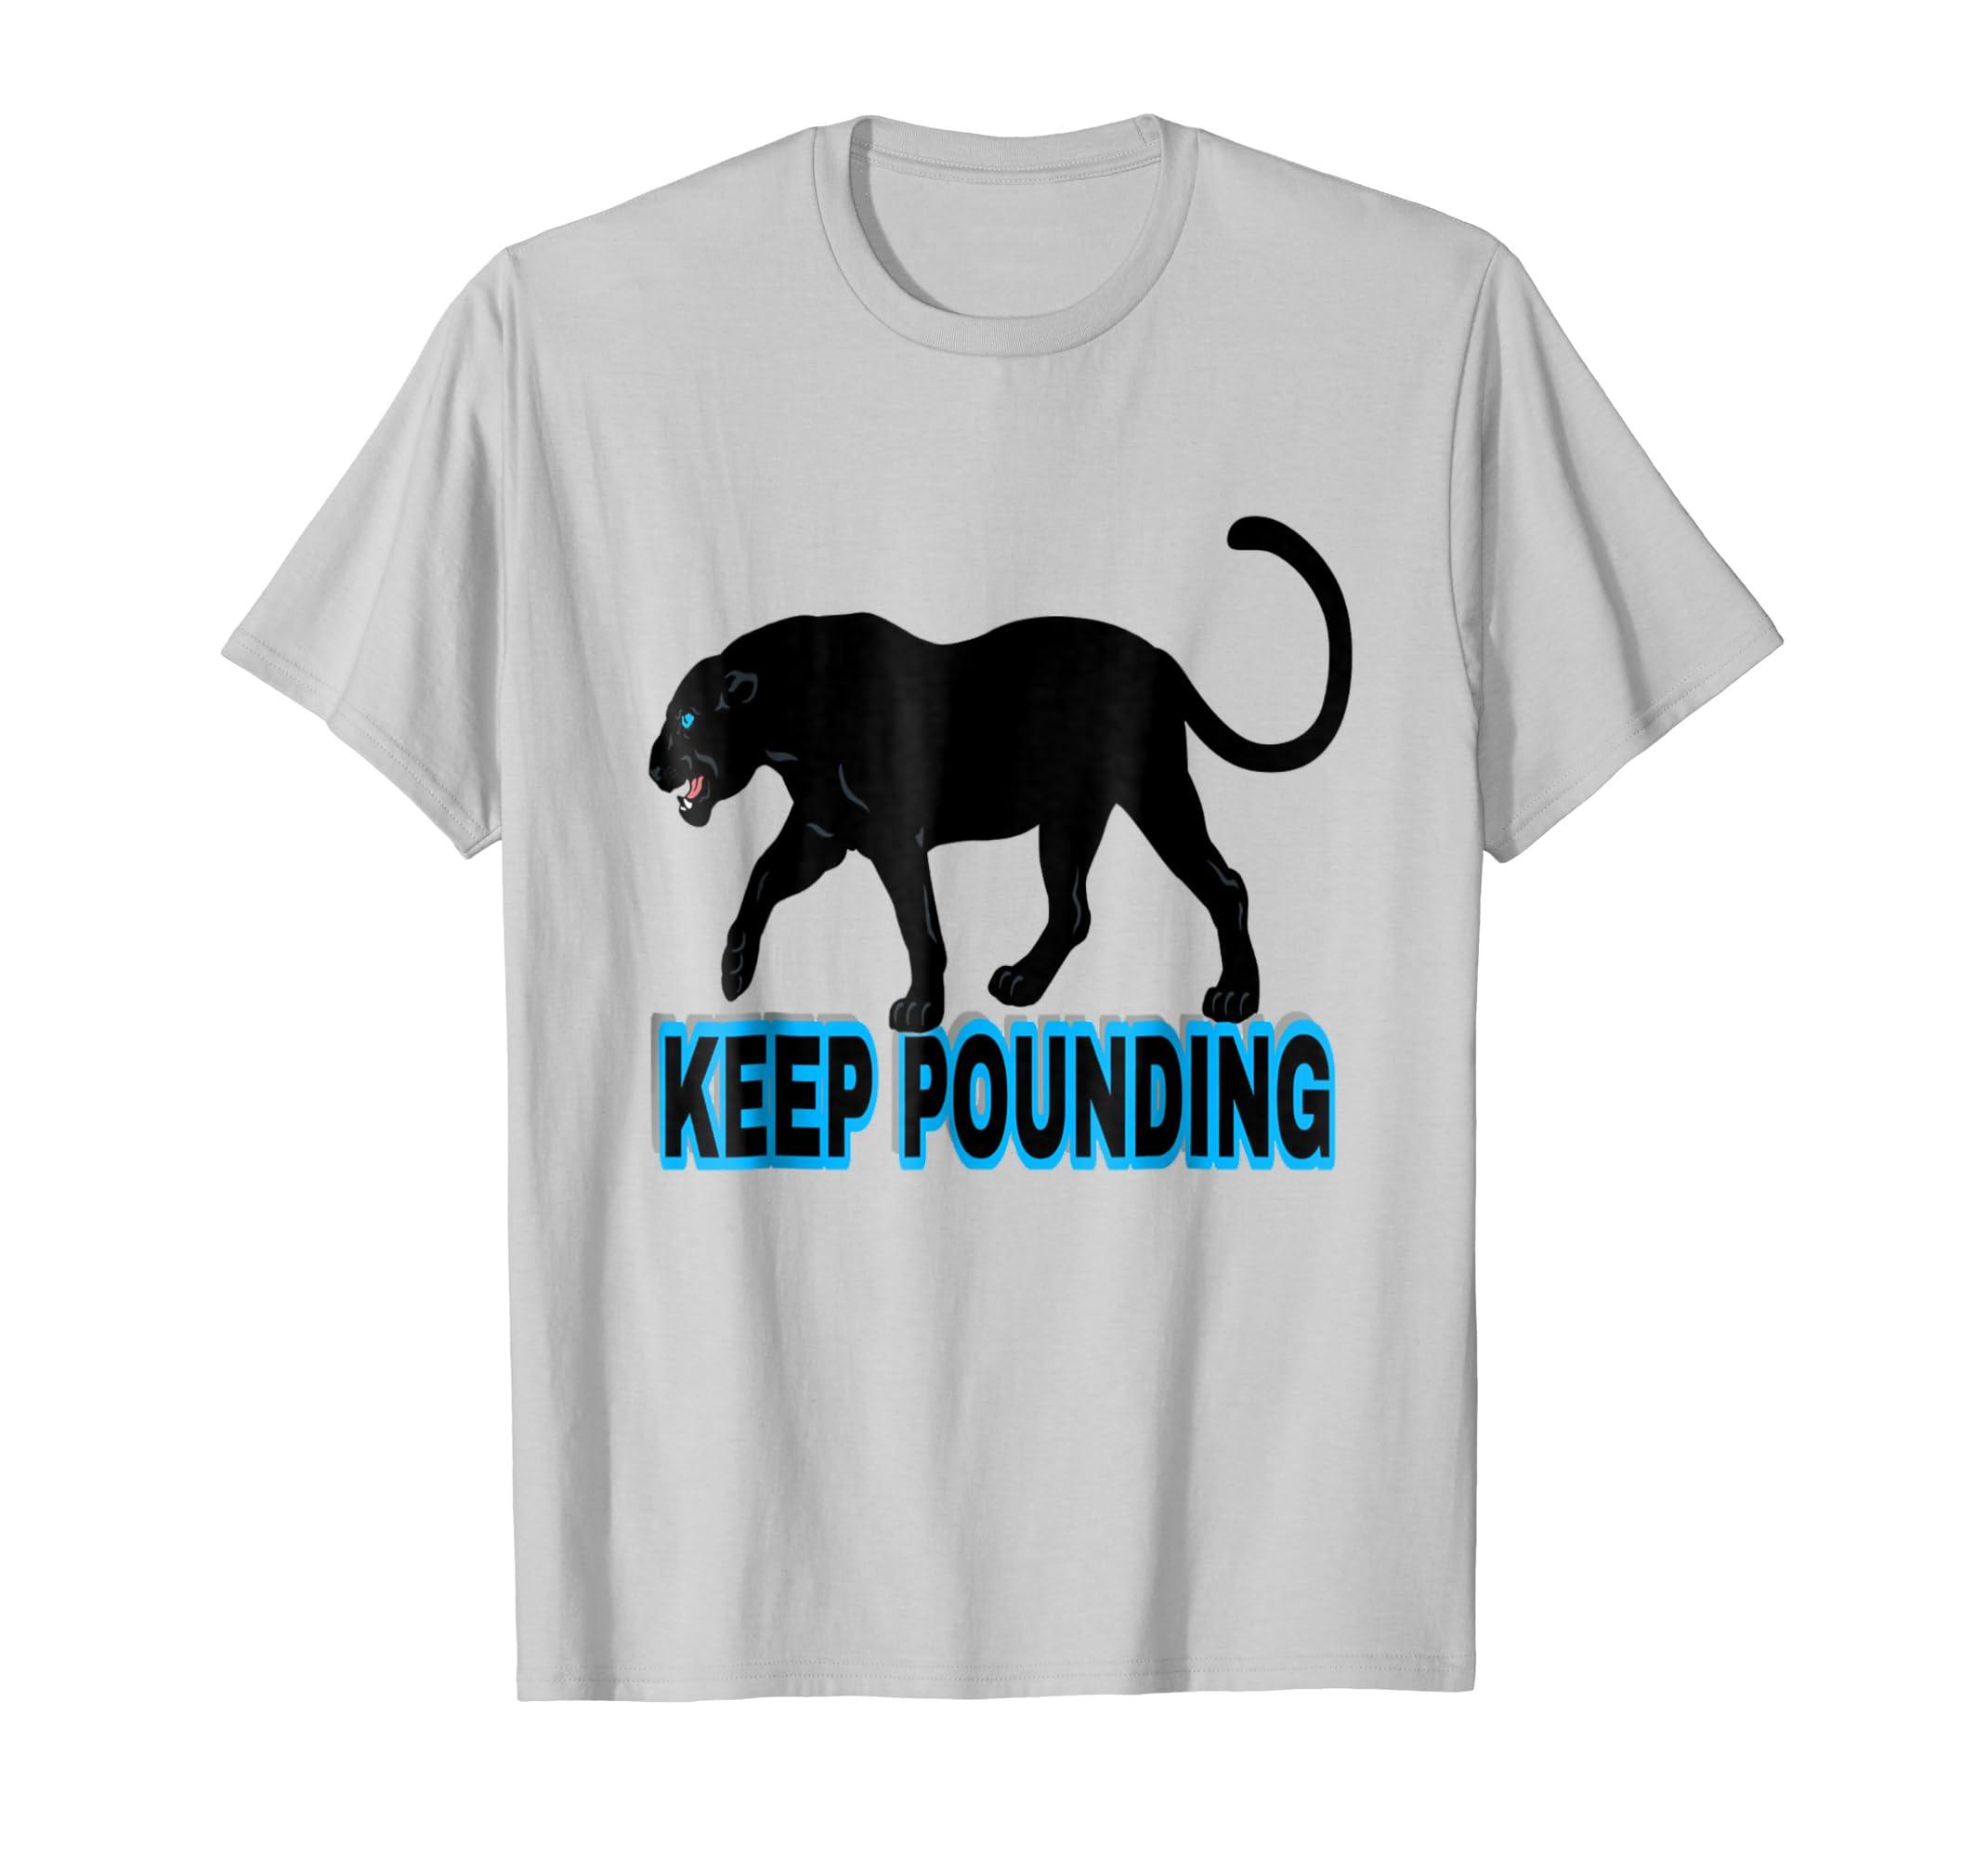 986afee8 Amazon.com: Keep Pounding T Shirt Panthers Football Shirt: Clothing